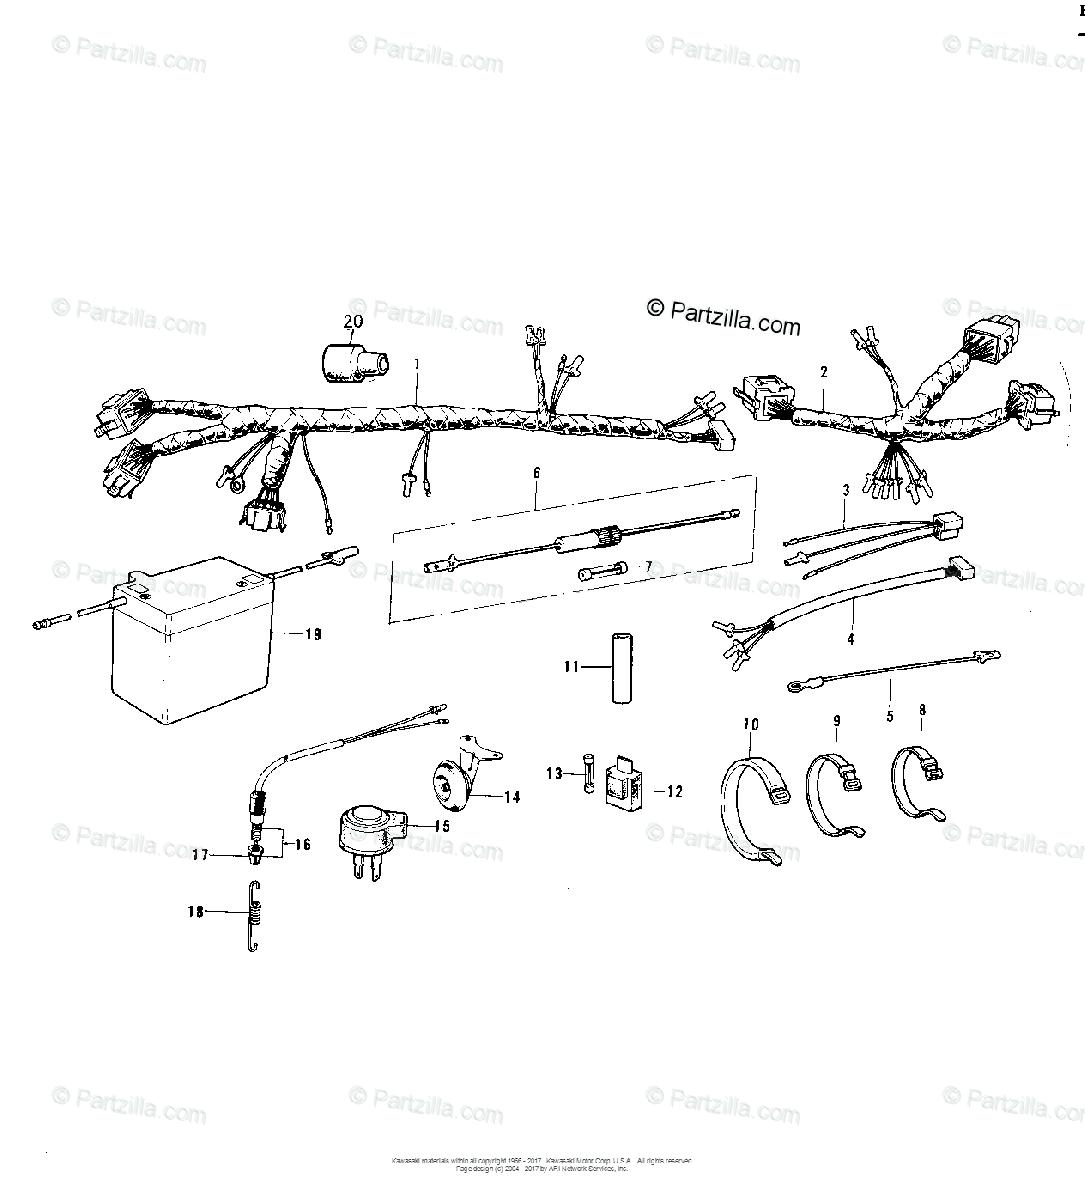 Ke100 Wiring Diagram 96 Faint Zagato Kidscostumes Club